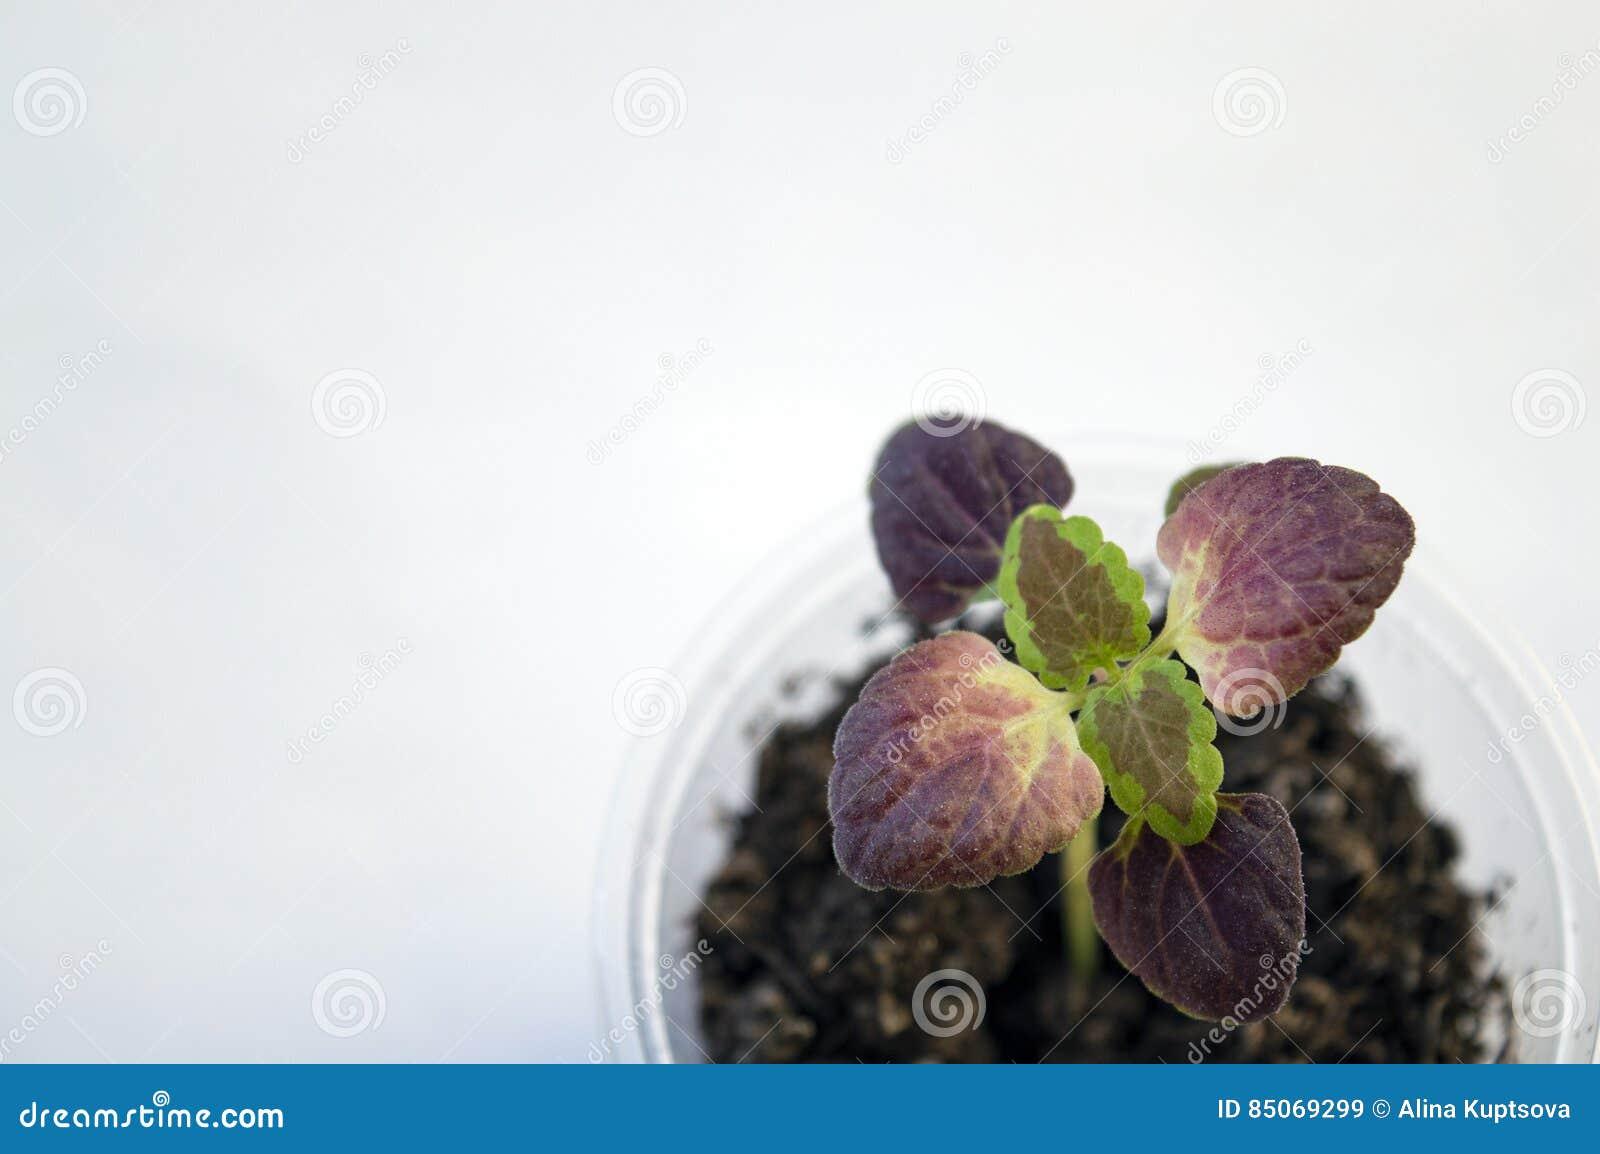 Coleus Black Dragon Seedling Background Stock Image - Image of ...